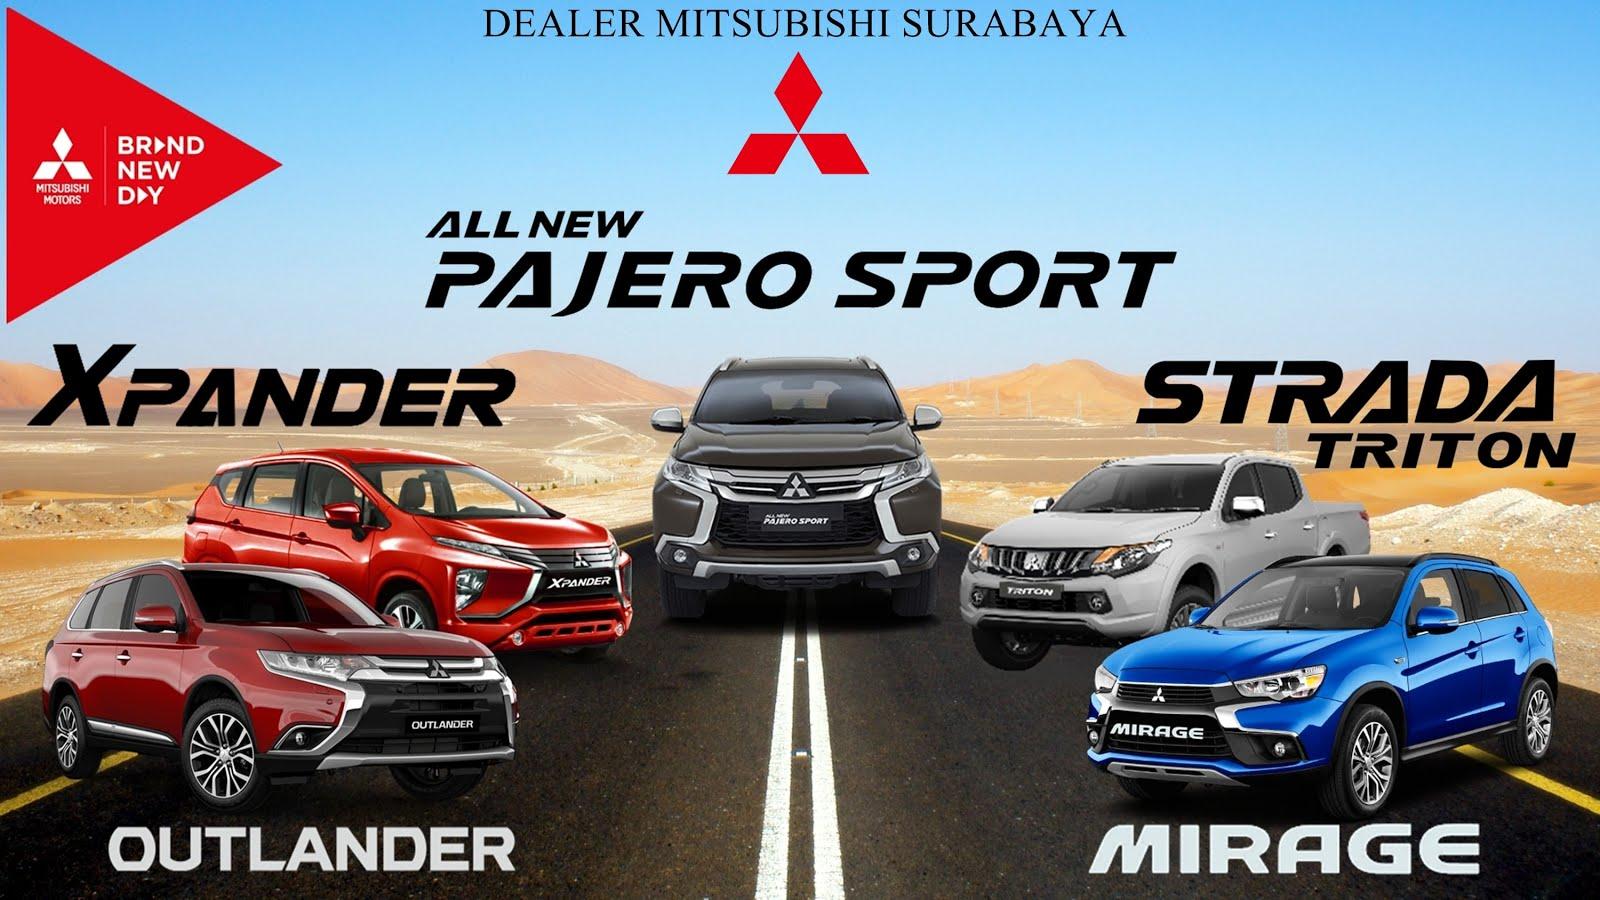 Dealer Mitsubishi Surabaya | 0812 3378 3568 | Harga Promo Mitsubishi